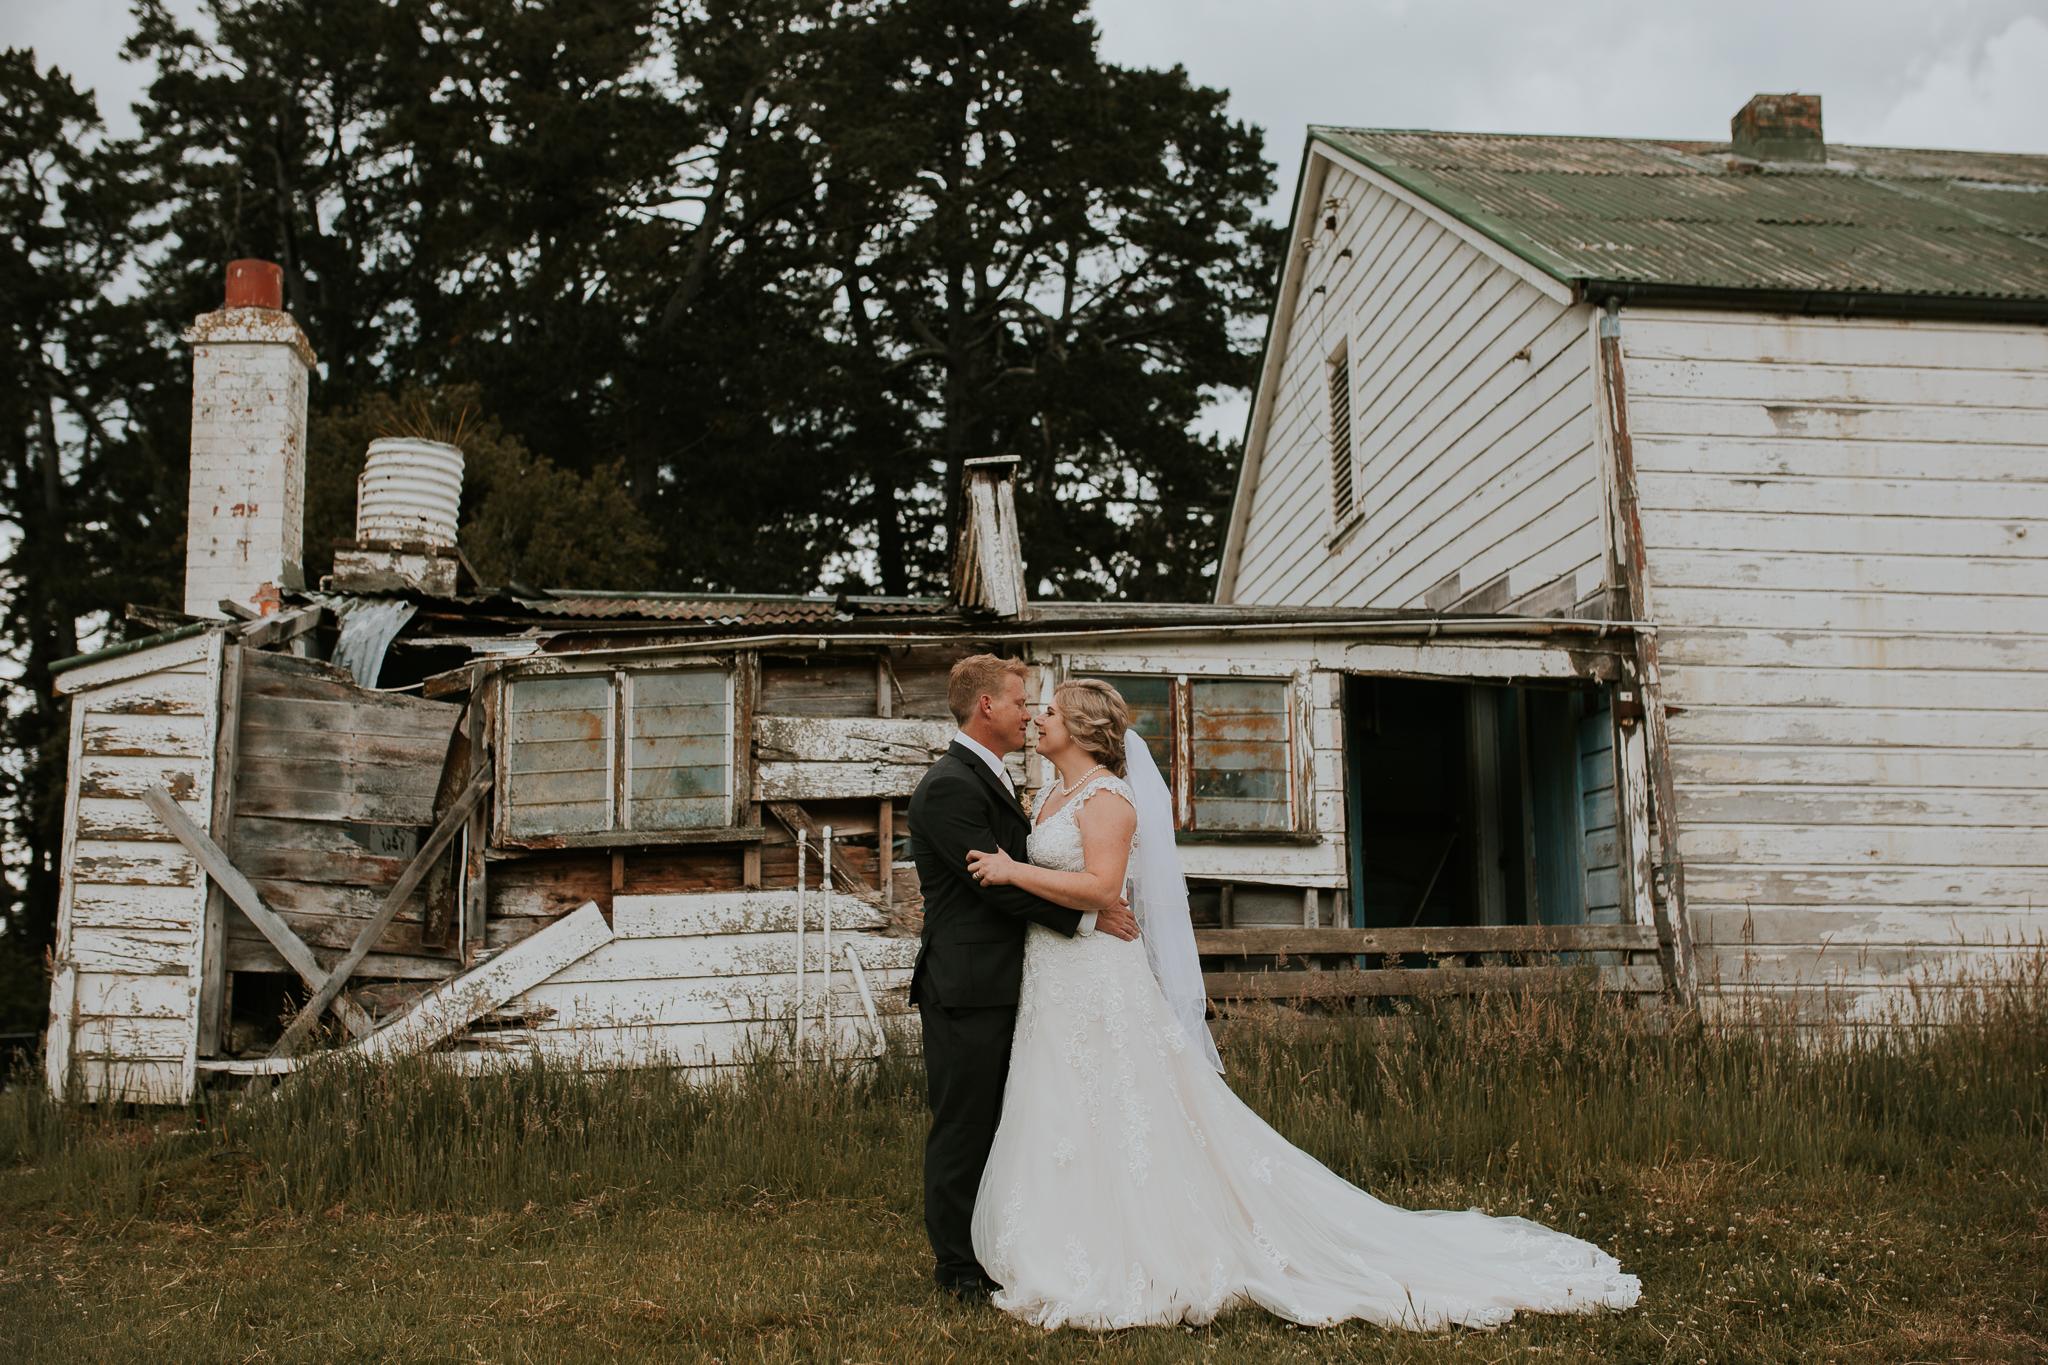 Lisa Fisher Photography gwavas homestead hawkebay-14.jpg